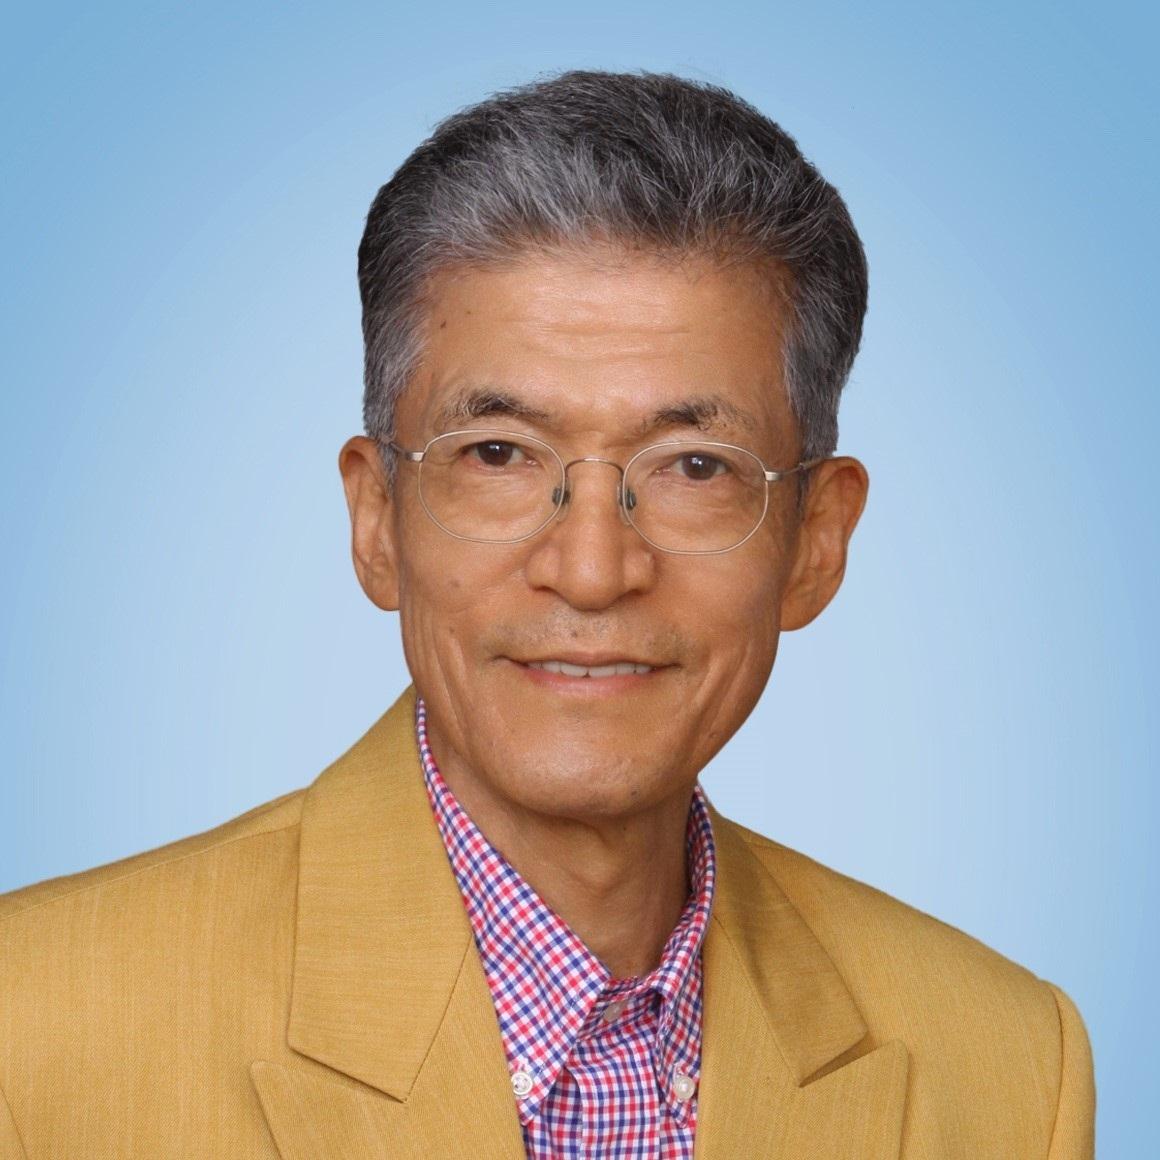 Robert Hoashi 3